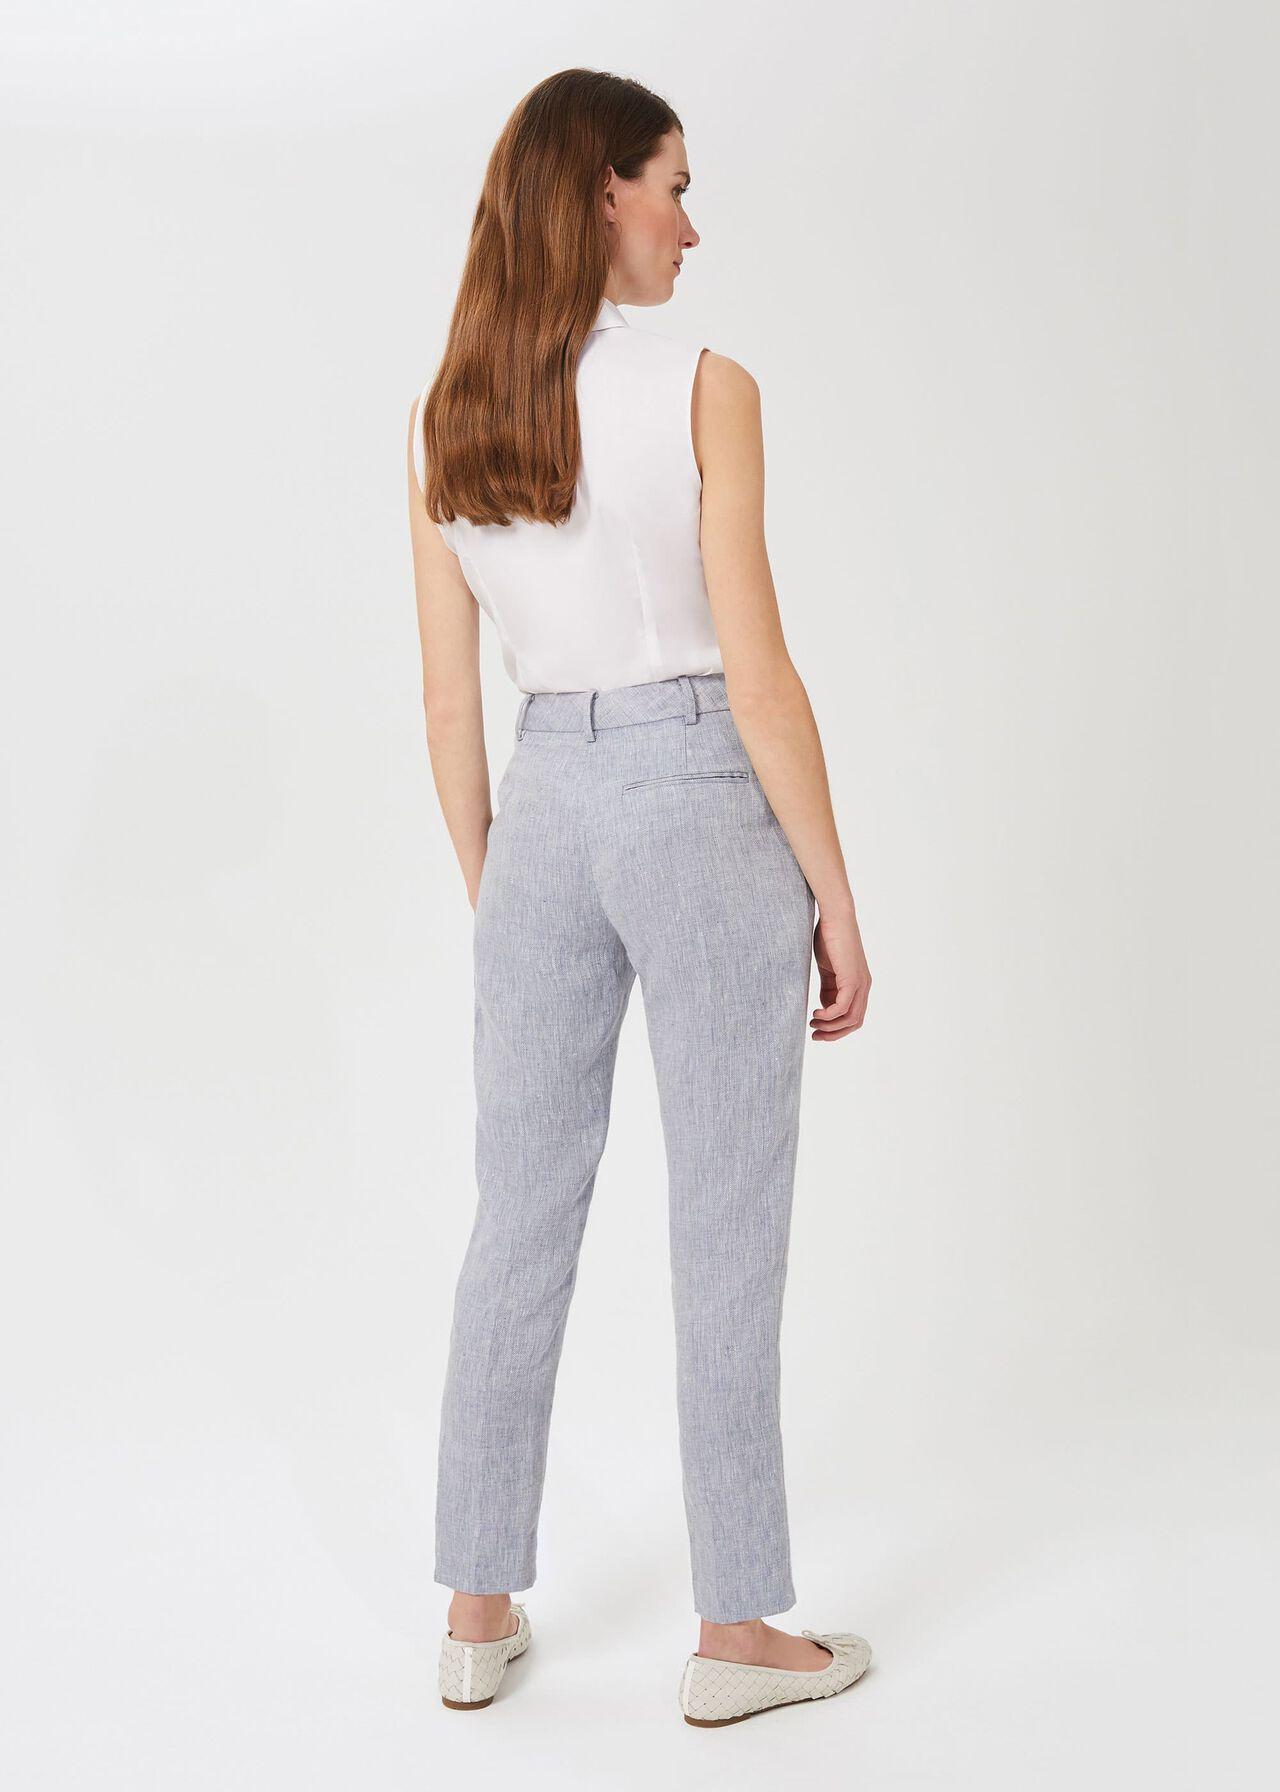 Ivana Linen Tapered Pants, Pale Blue, hi-res